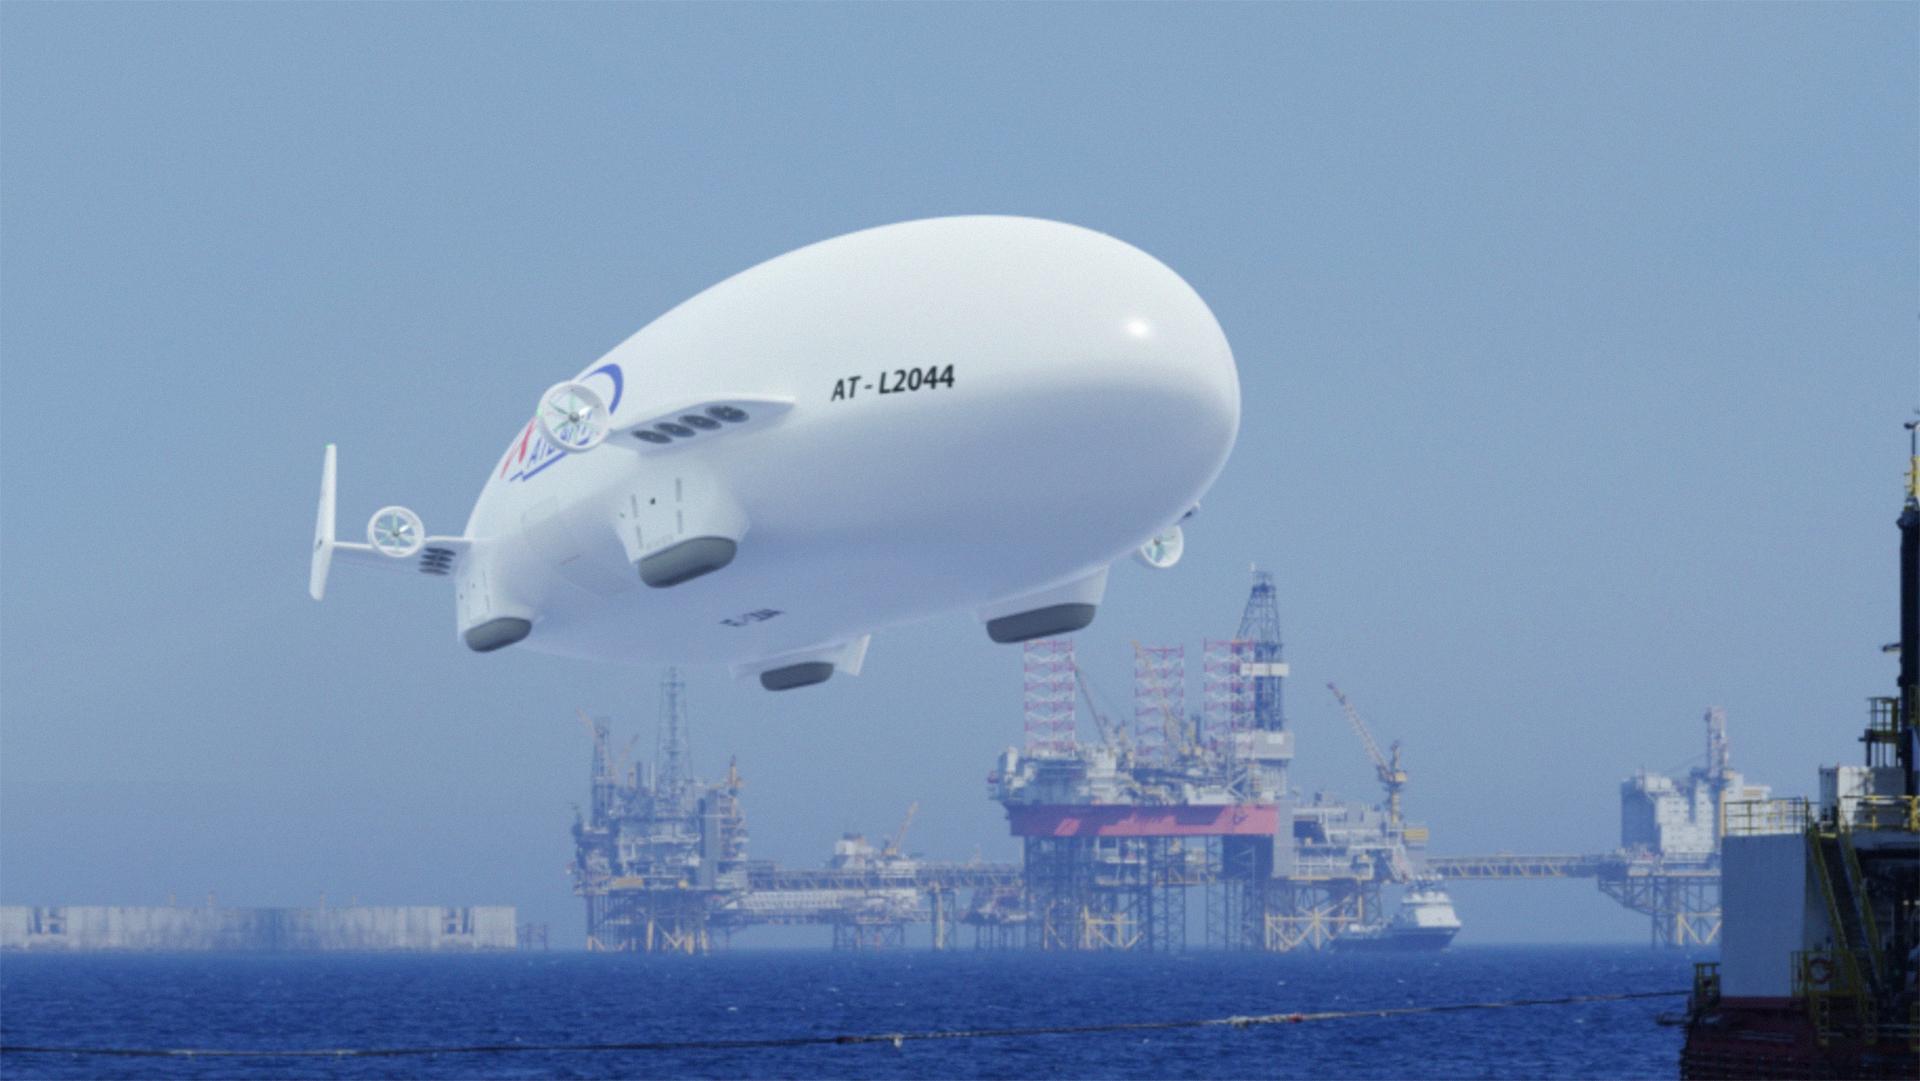 "<p>Фото © <a href=""https://atlas-lta.com/atlant_cargo_airship/"" target=""_blank"" rel=""noopener noreferrer"">Atlas</a></p>"